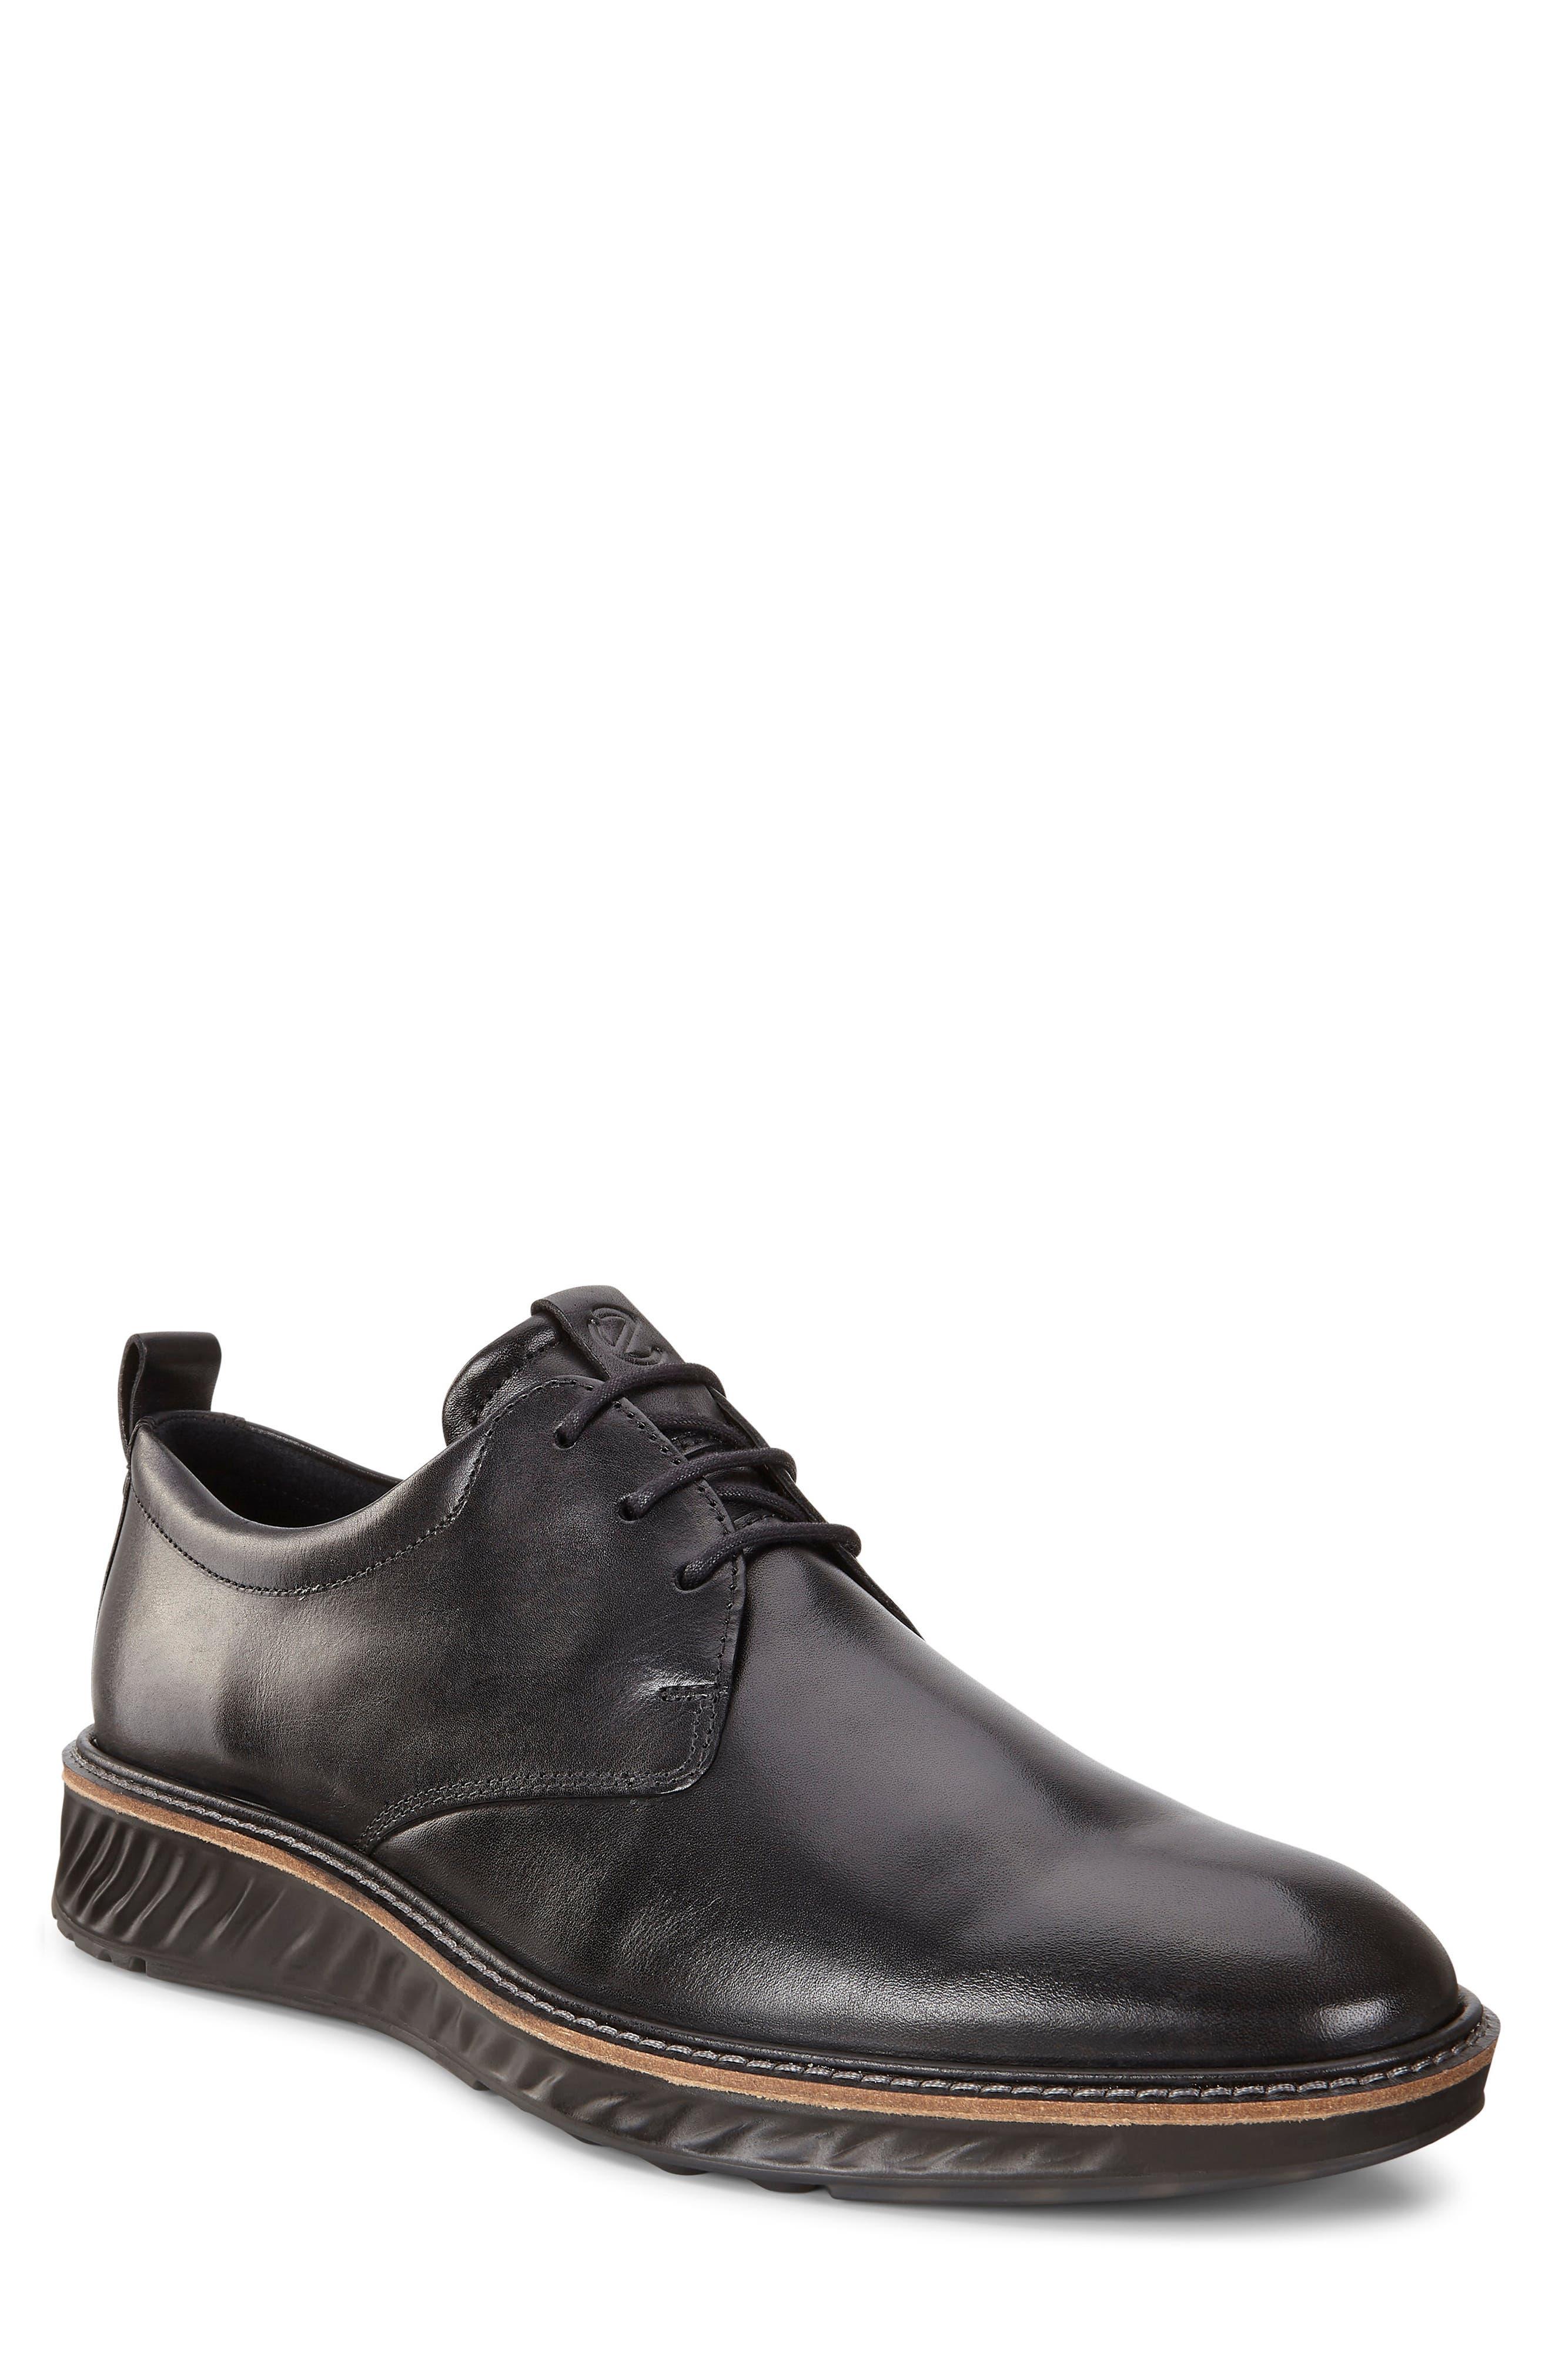 ecco black dress shoes